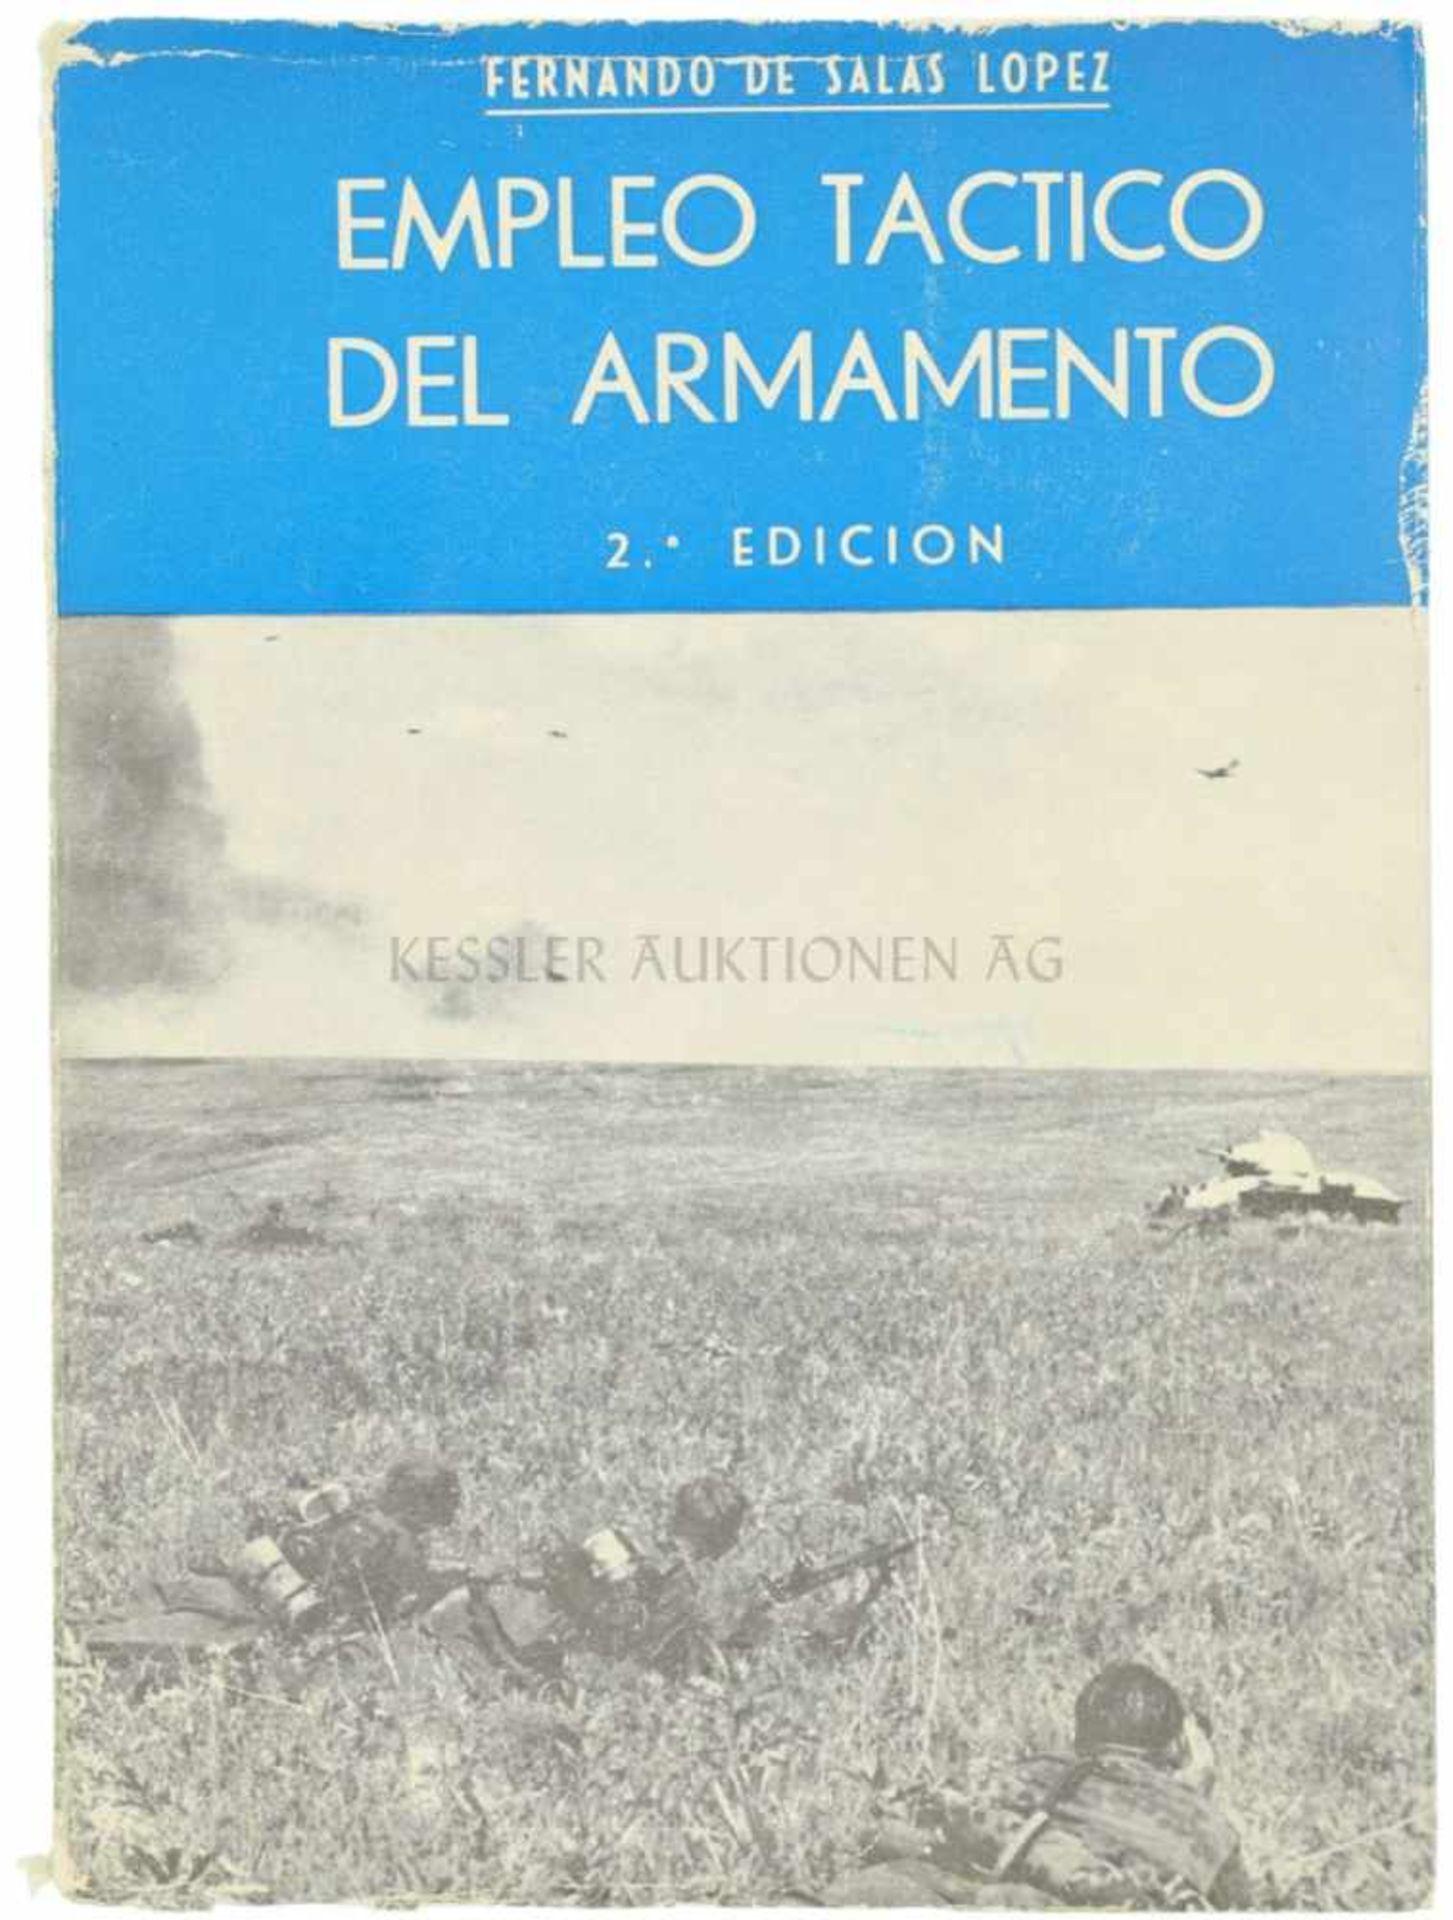 Empleo Tactico Del Armamento 2. Auflage, Autor Fernando De Salas Lopez, 1115 Seiten, in spanischer